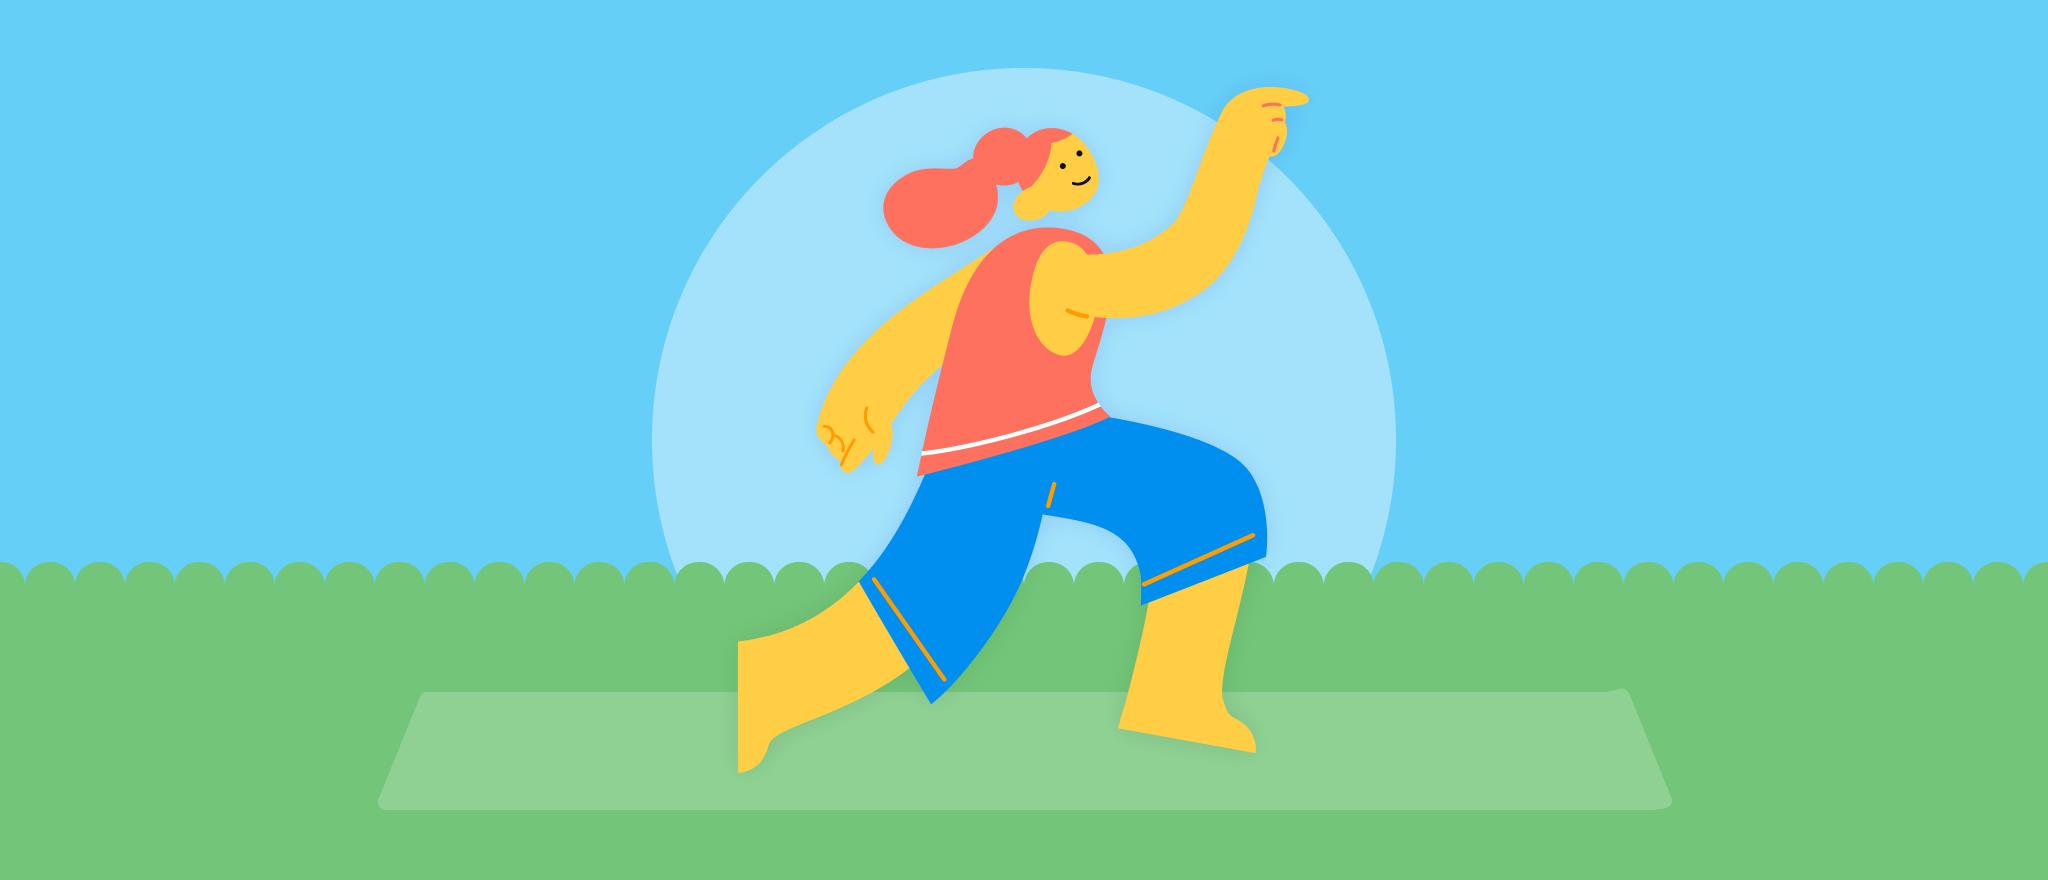 Yoga and rheumatism